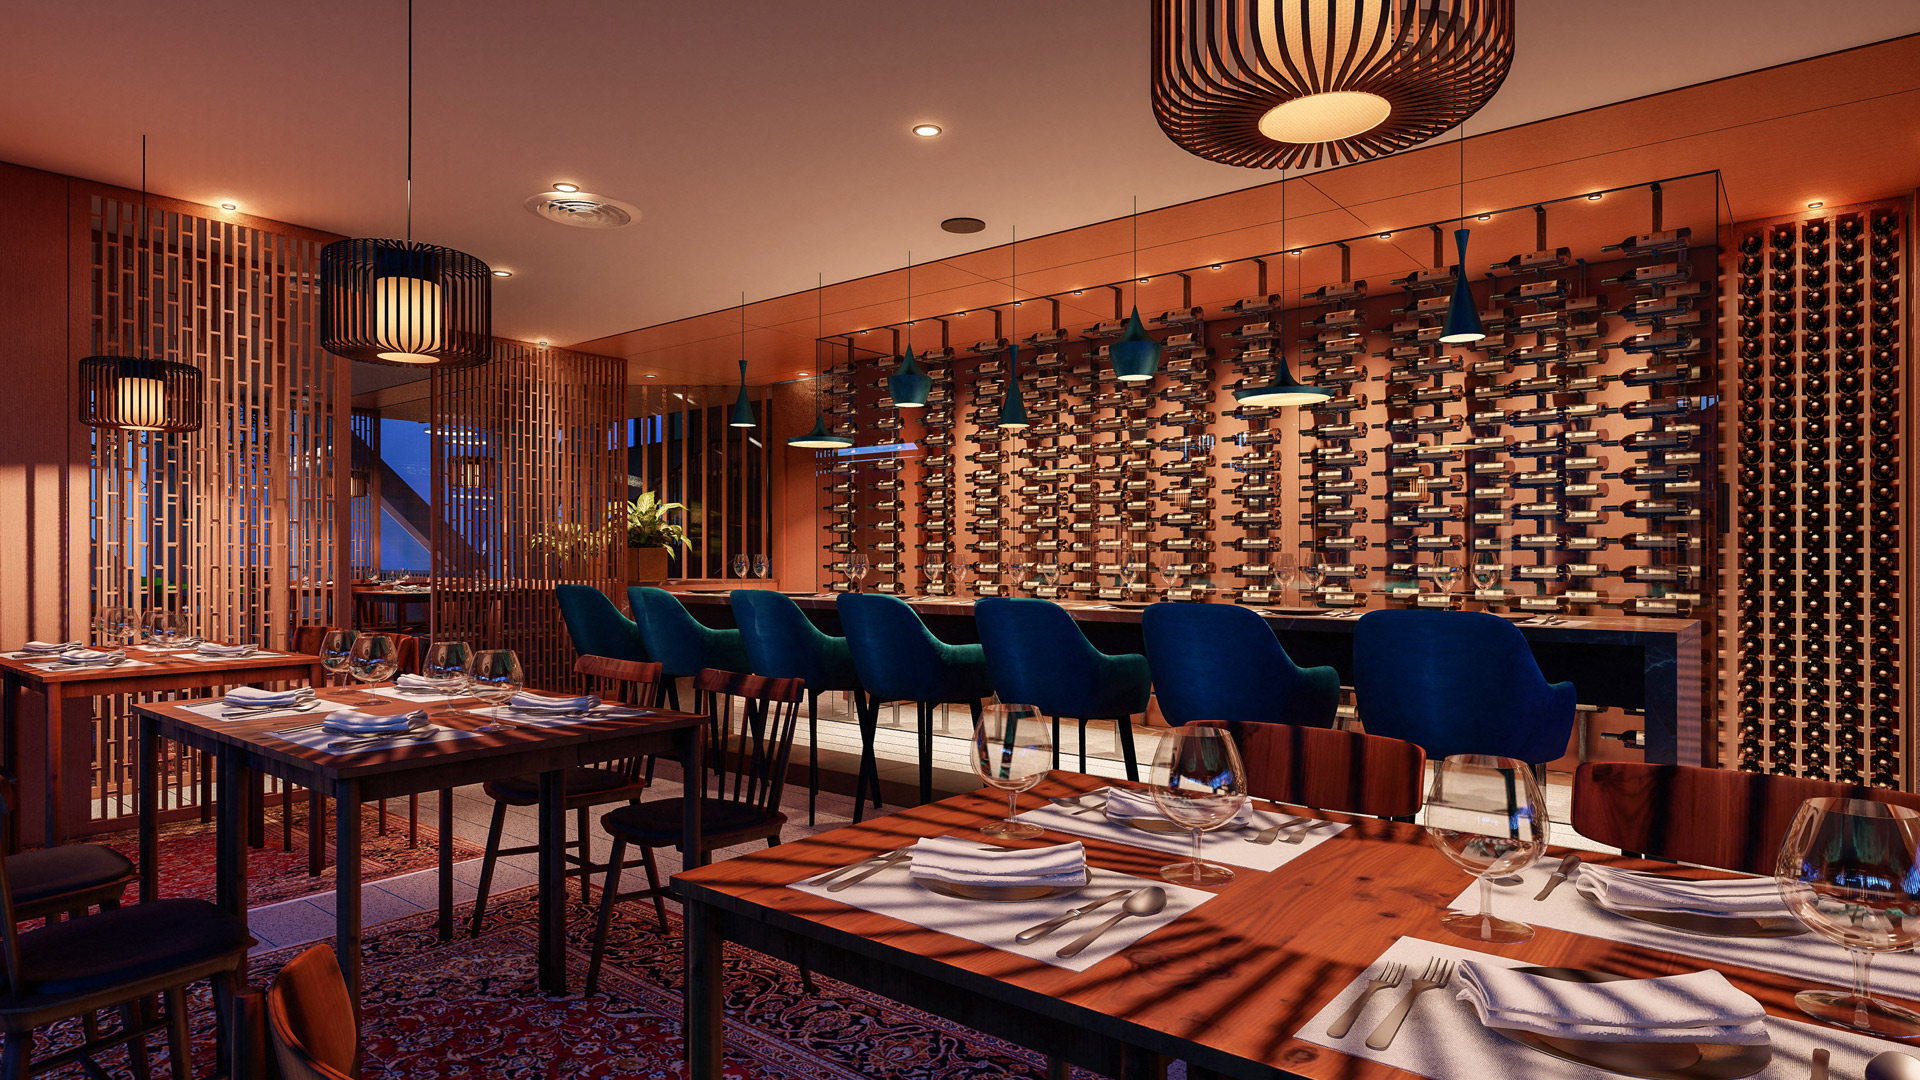 MAP-Wine-cellar-interior-design-architecture-architect-kiran-mathema-tasting-counter-display-night